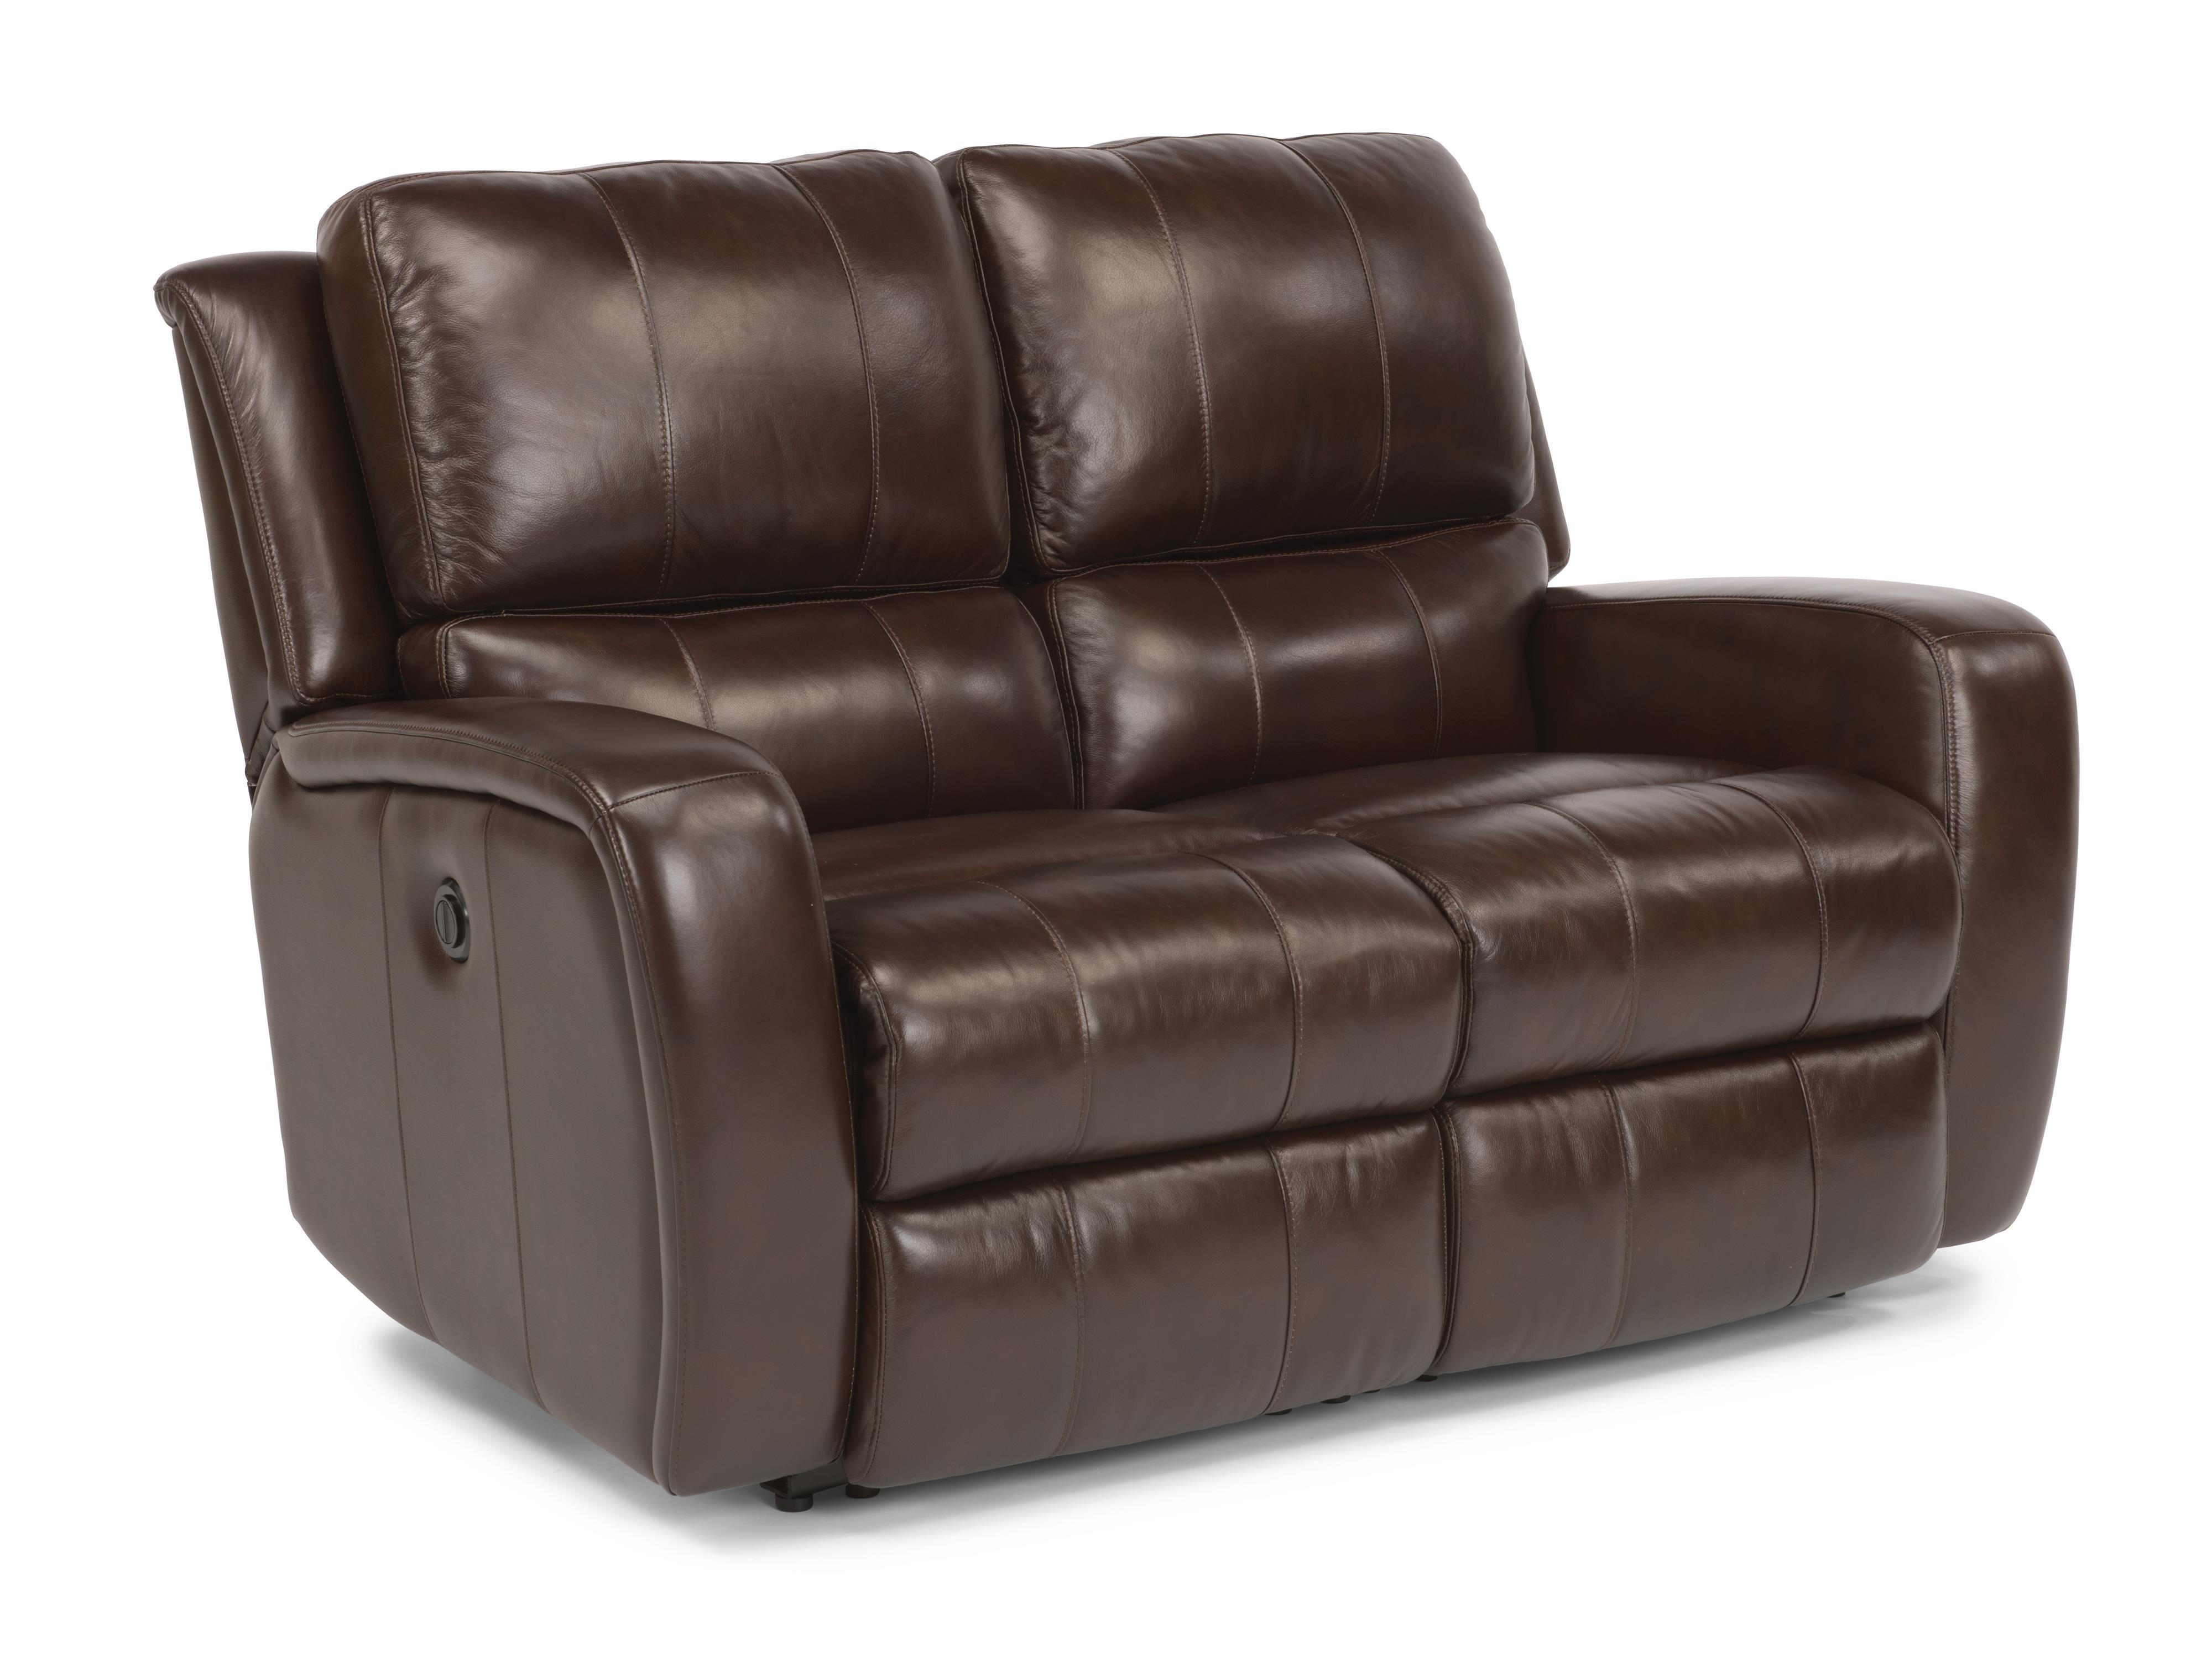 Flexsteel Latitudes-Hammond Reclining Love Seat w/ Power - Item Number: 1157-60P-555-72